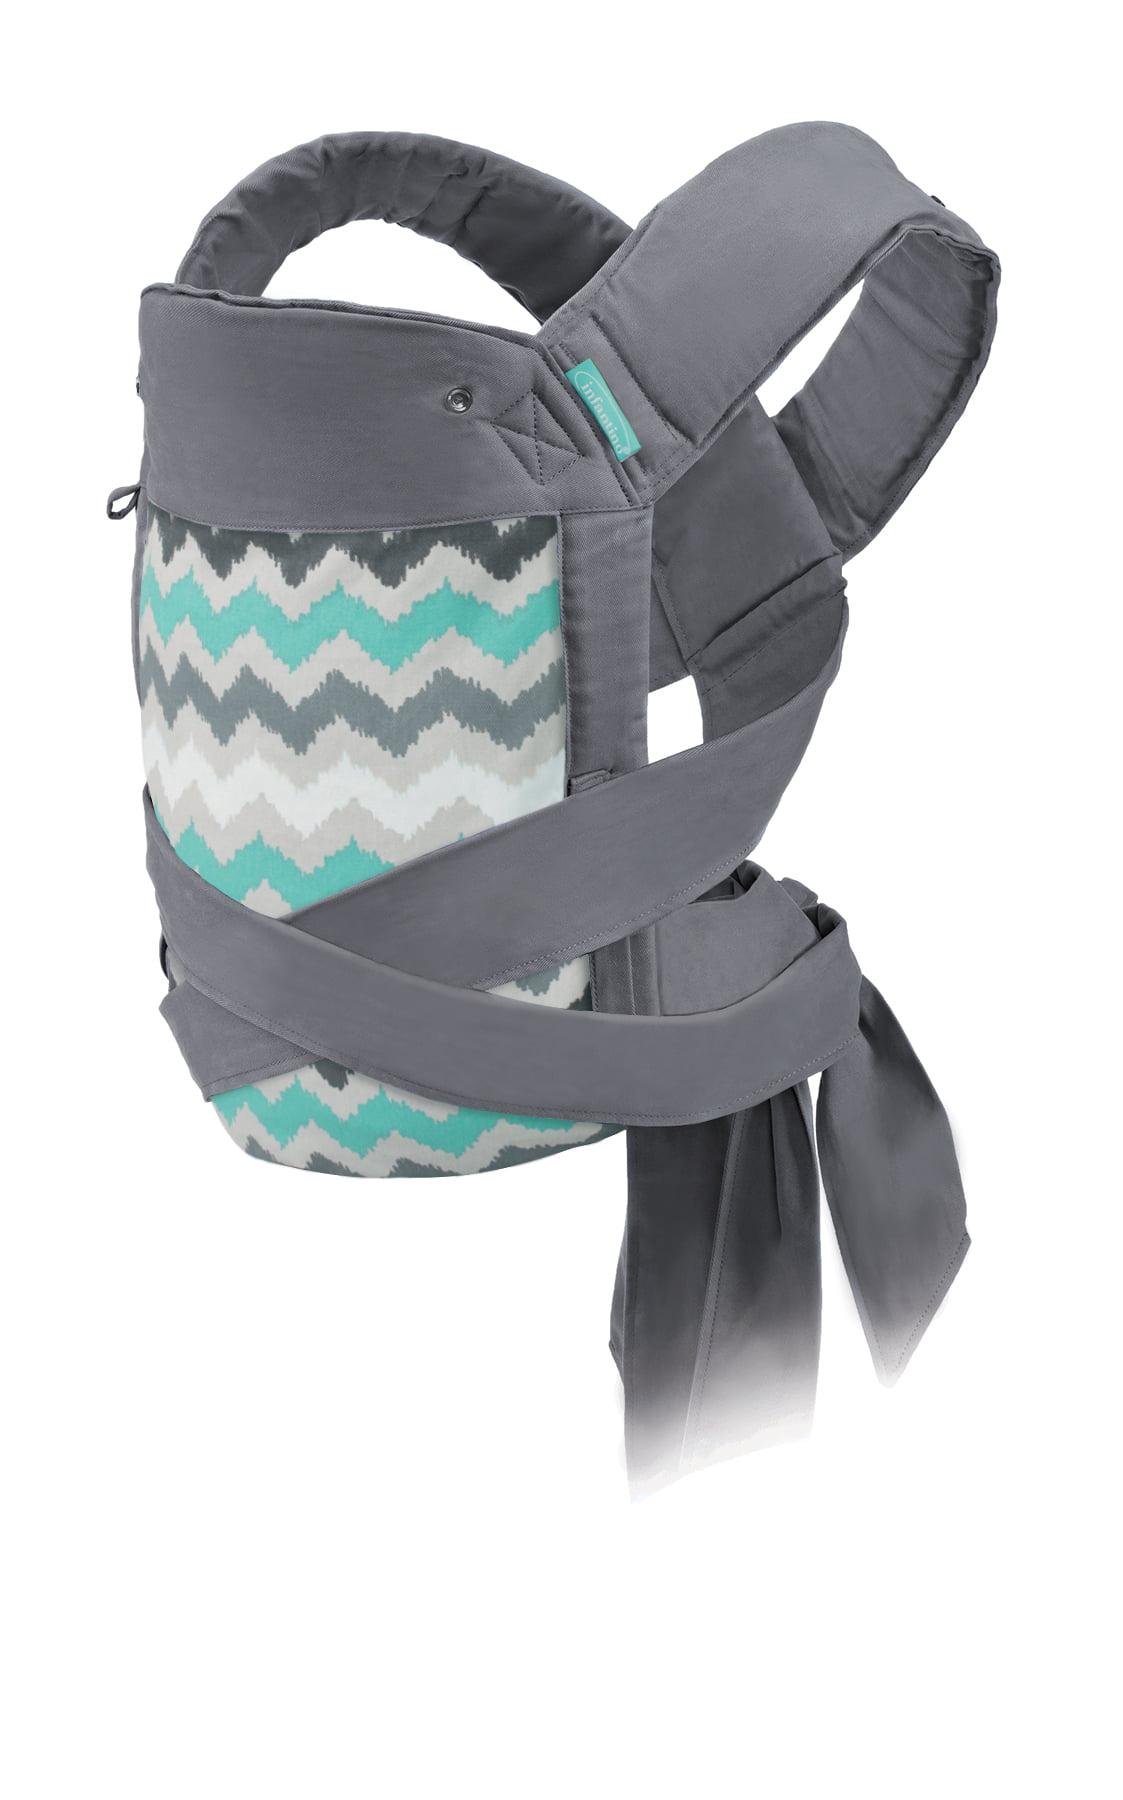 6e7801c5e1a Infantino Sash Wrap   Tie Mei Tai Carrier